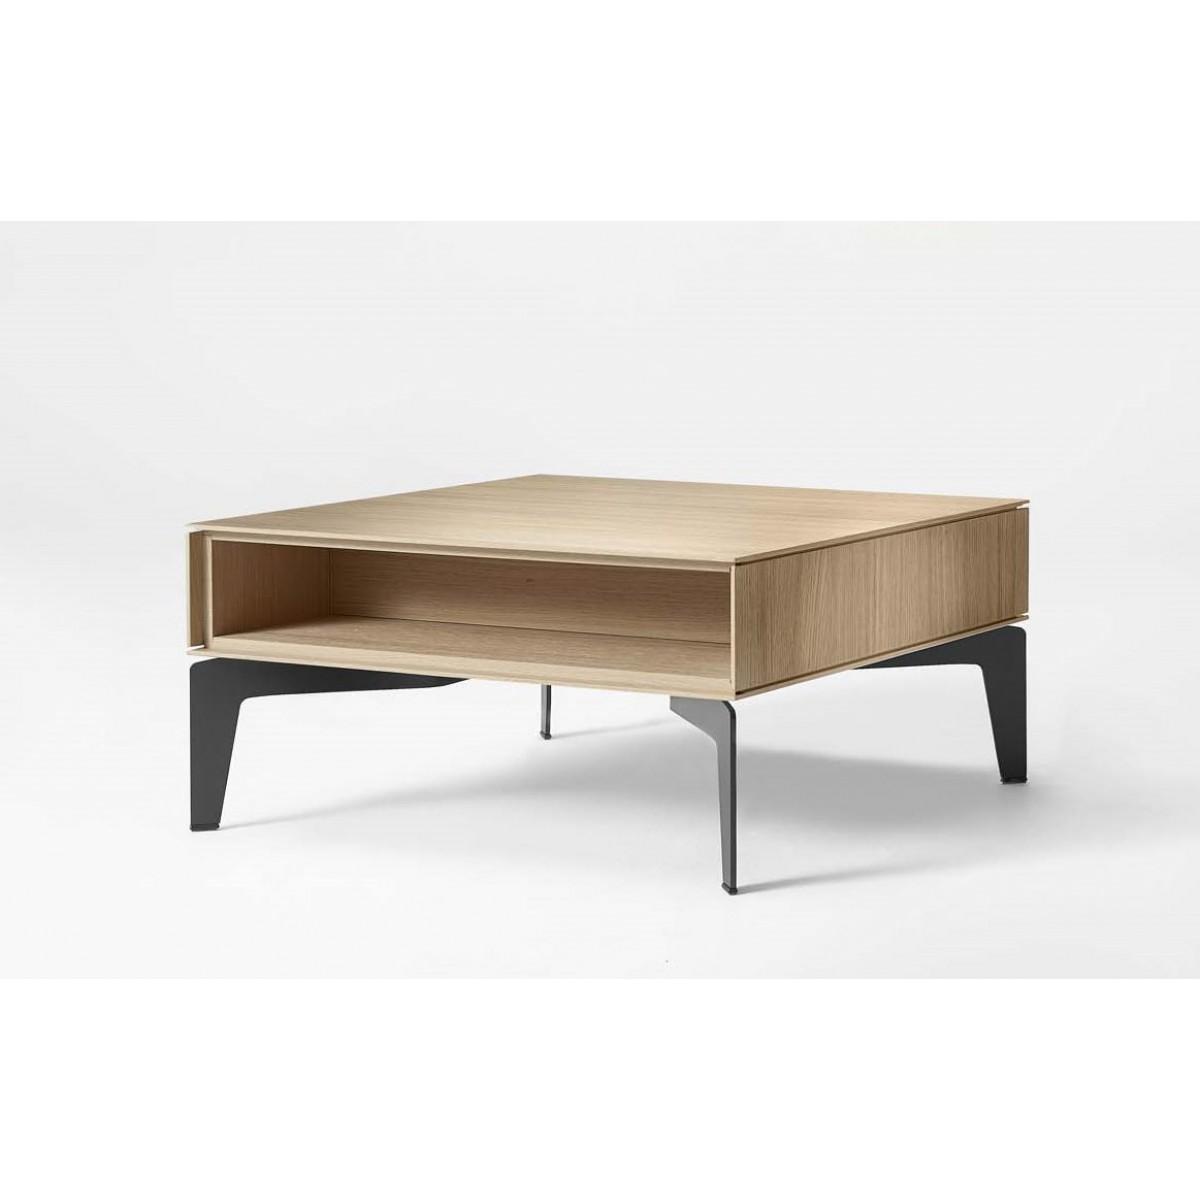 bloom-salontafel-vierkant-bl29-lade-metalen-poot